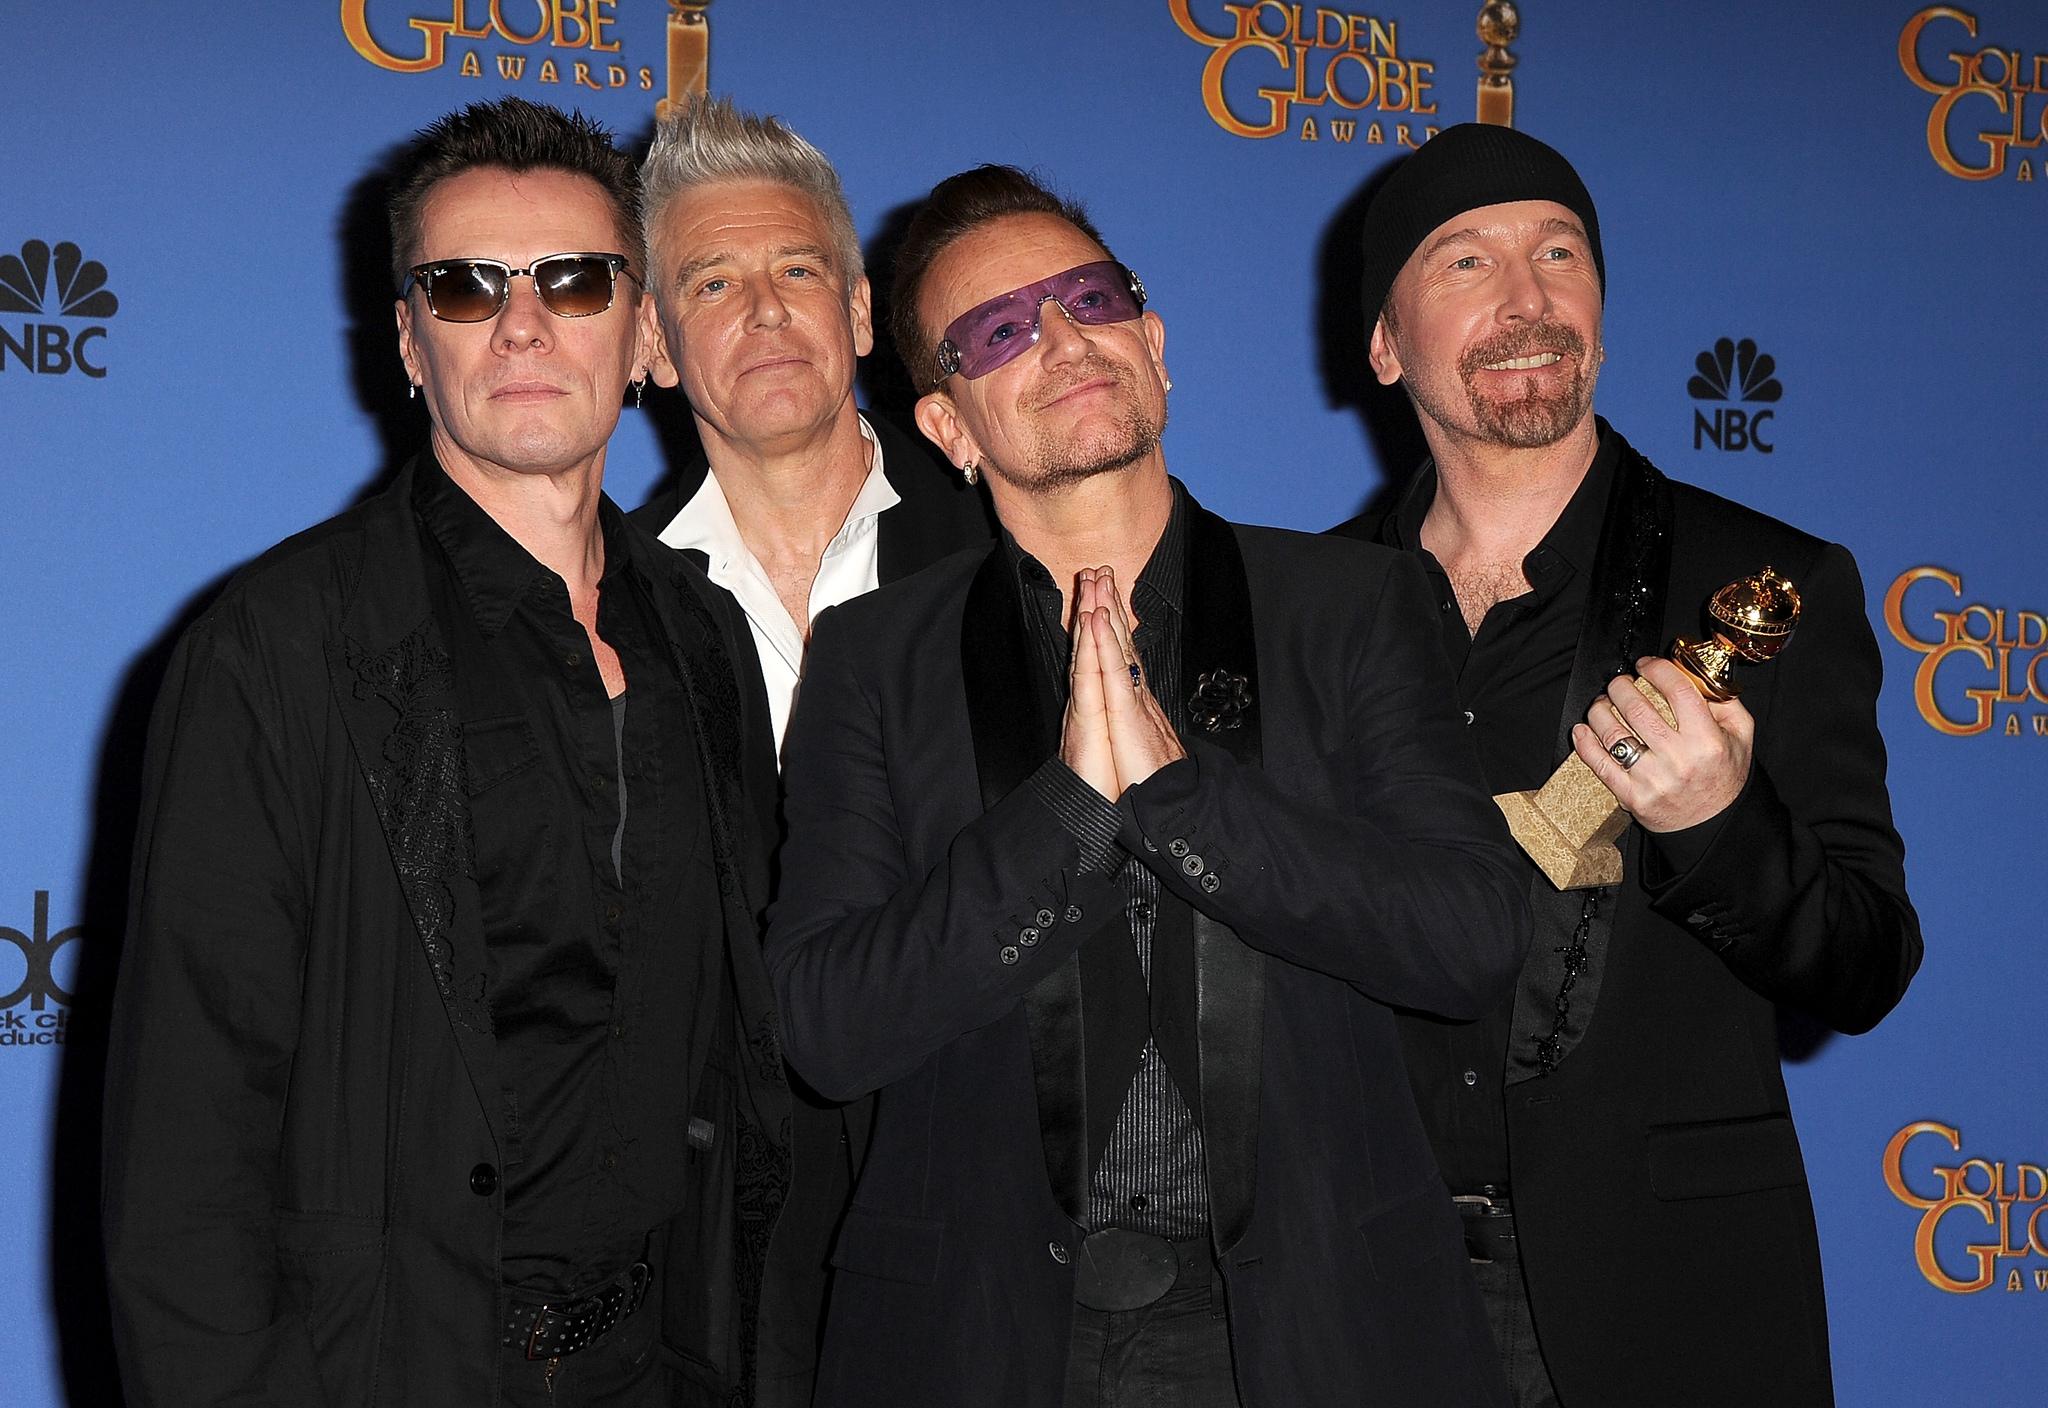 Bono, Adam Clayton, Larry Mullen Jr., The Edge and U2